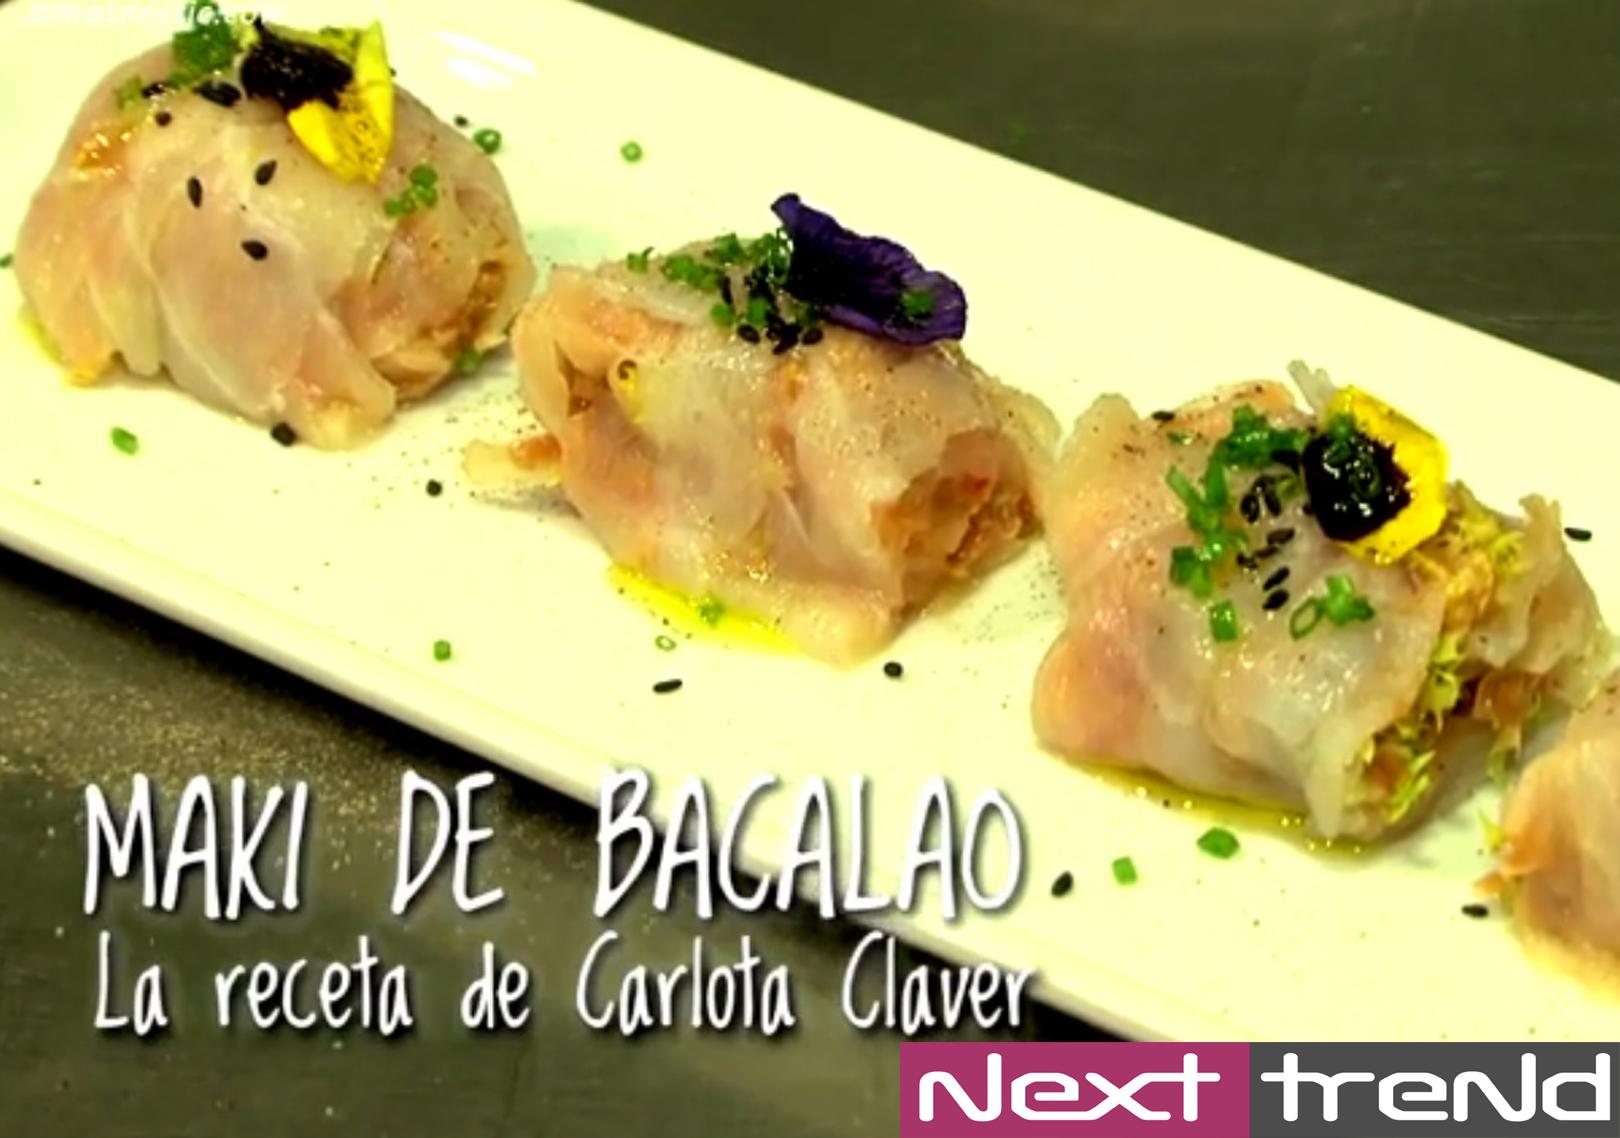 maki-bacalao-carlota-claver-restaurant-barcelona-nexttrend